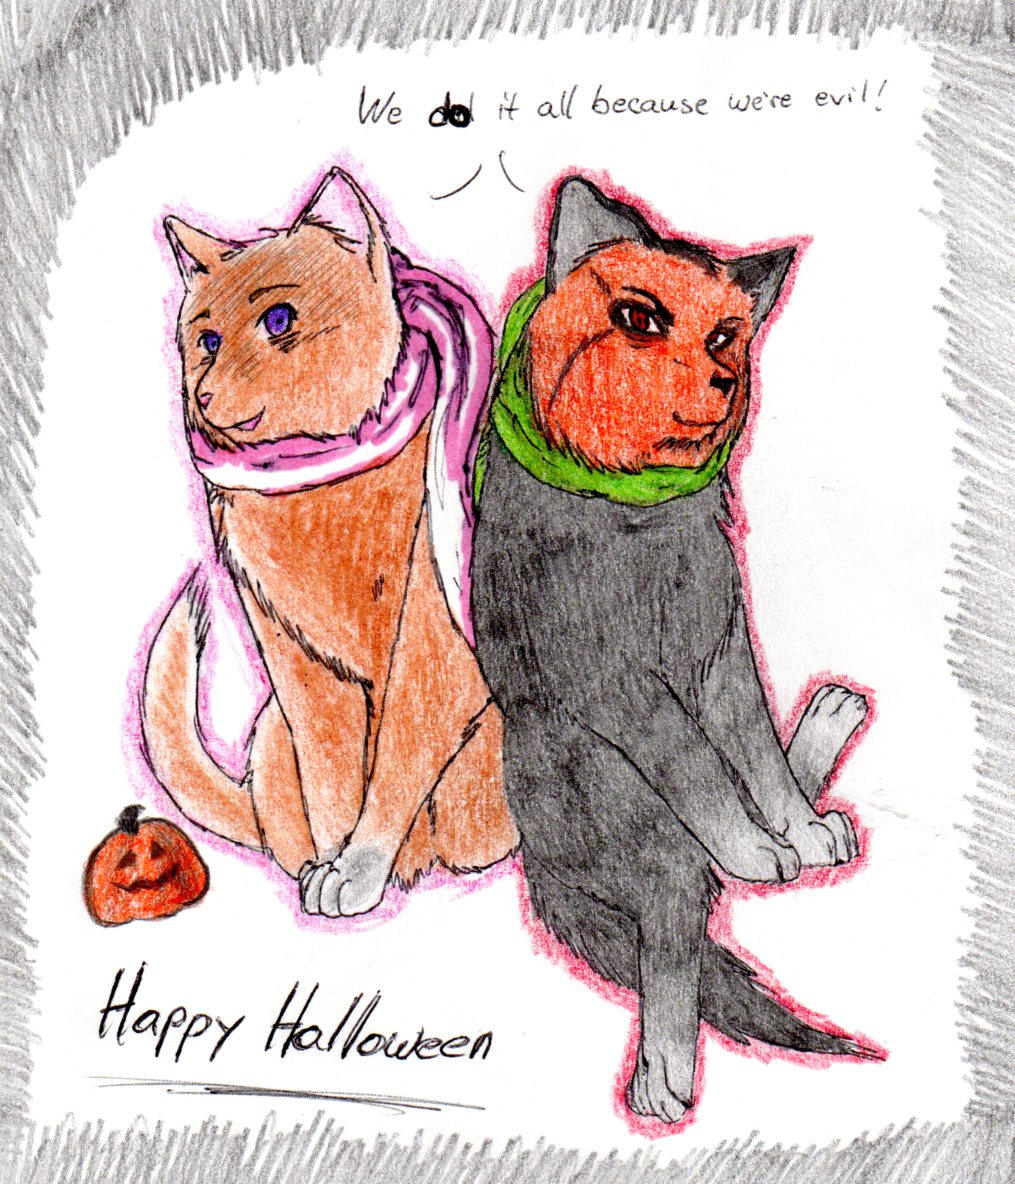 Happy Halloween by nightwindwolf95